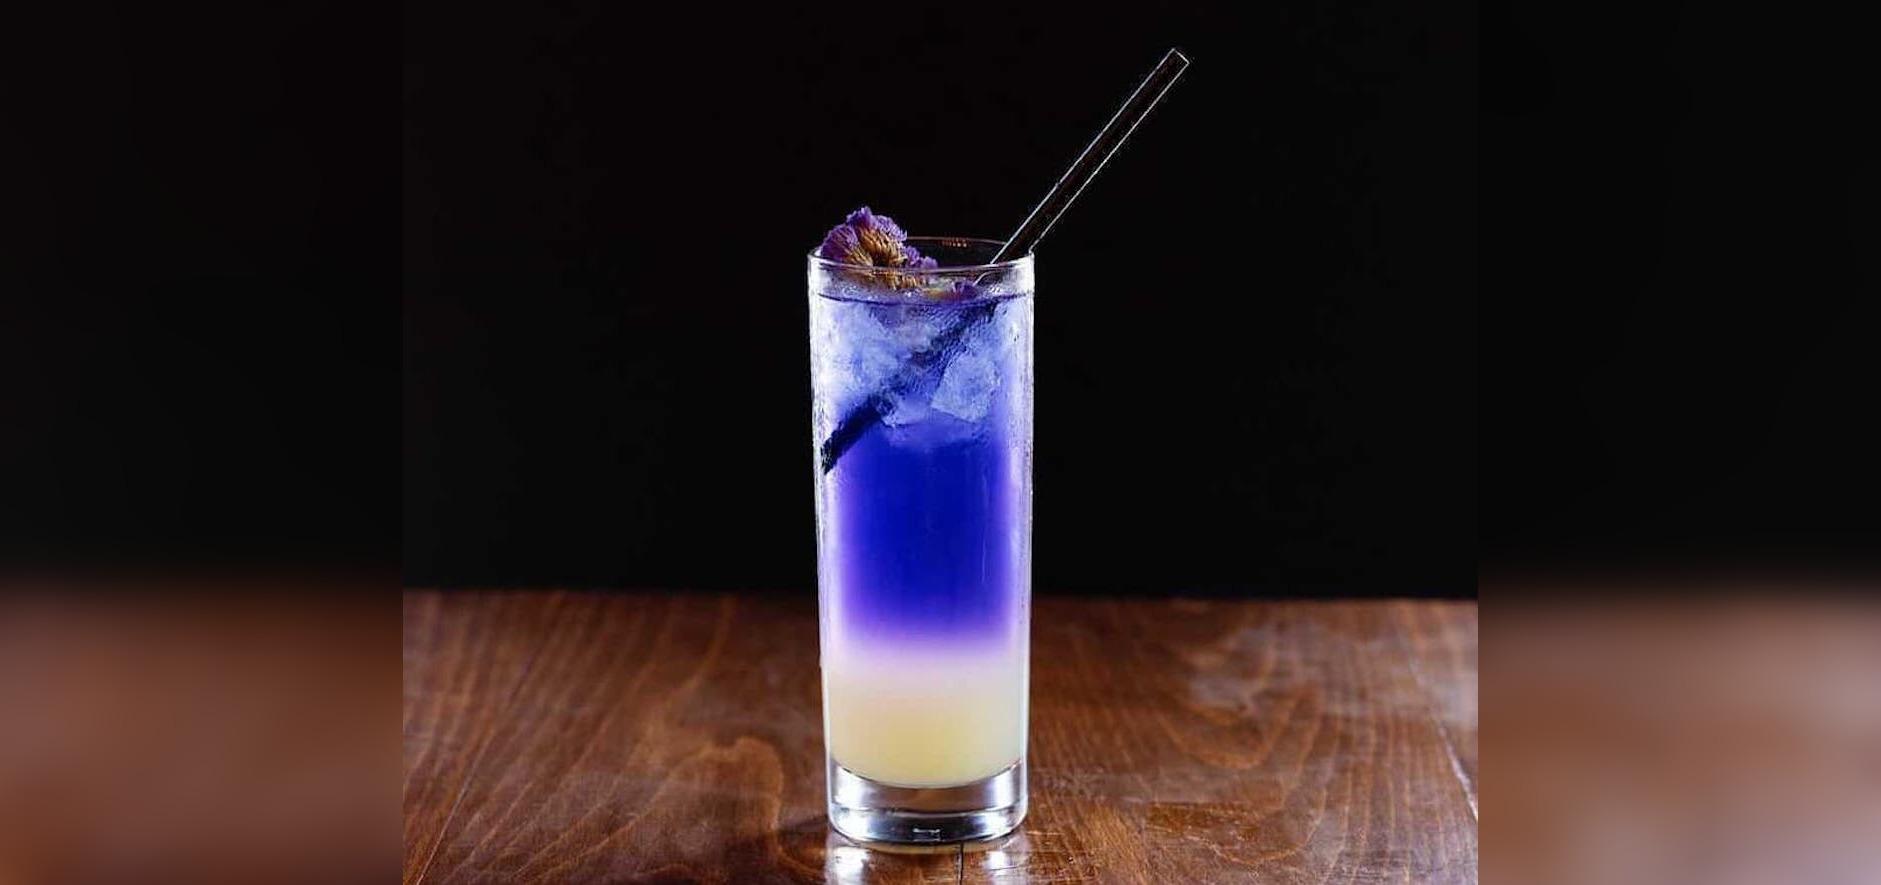 Toronto's newest cocktail bar features a Eurocentric menu